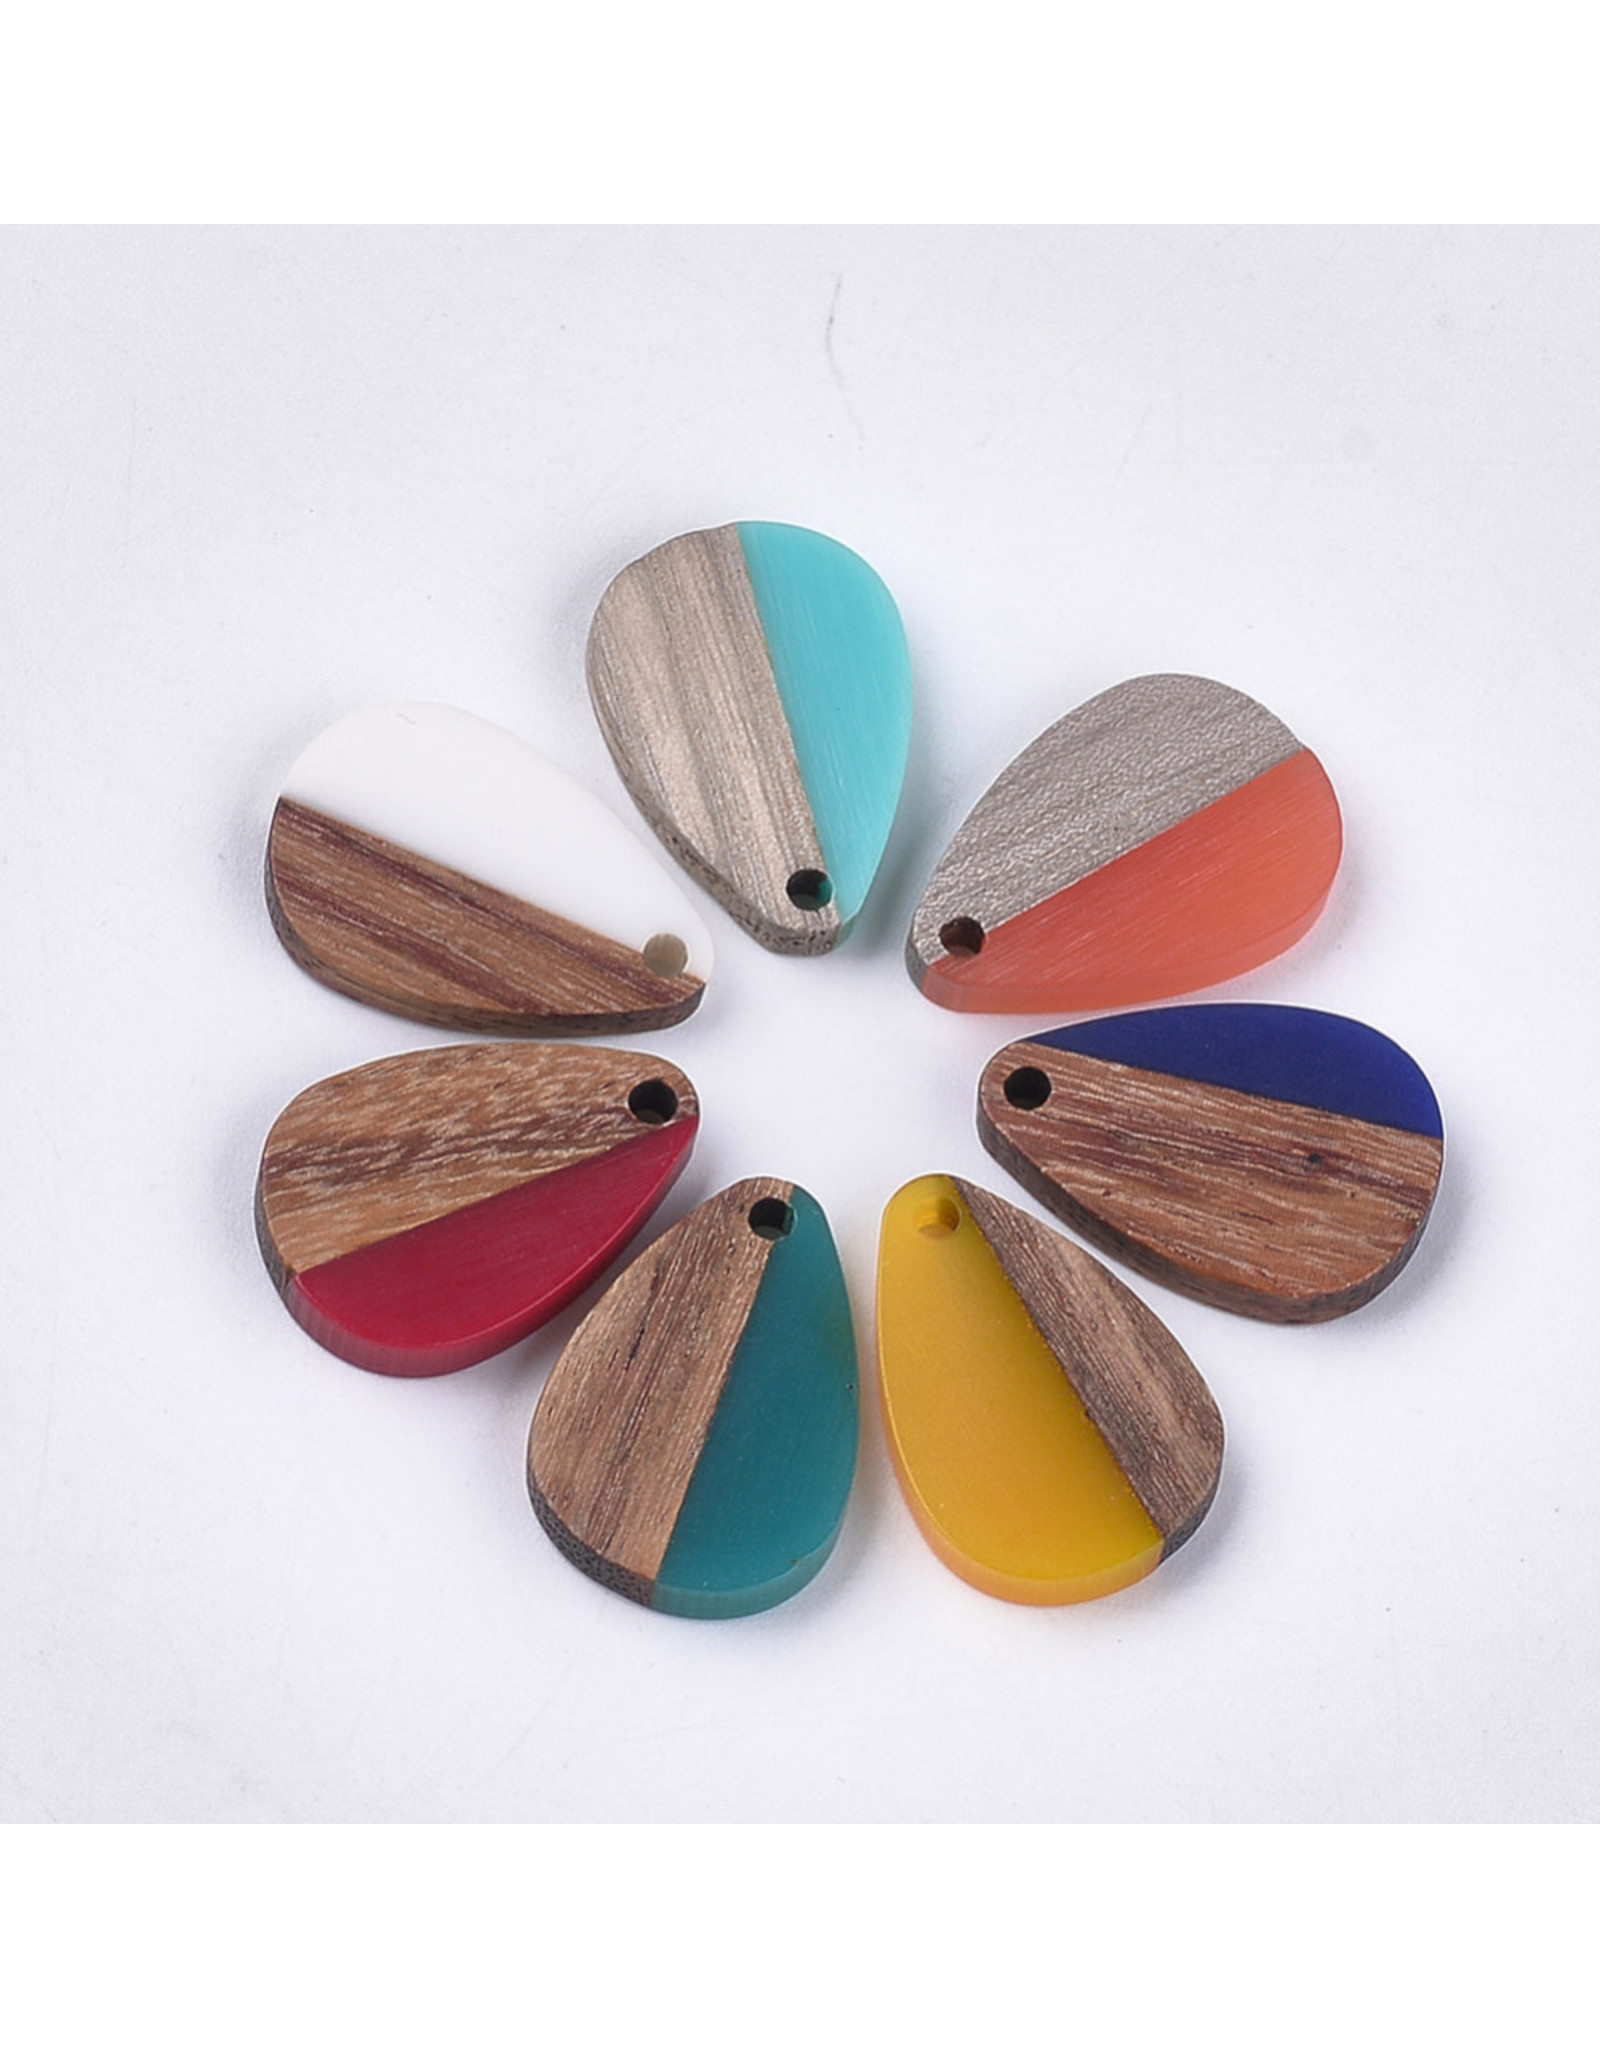 Wood Resin Drop  Assorted Colours  21x14x3mm  x1  Random Colour Pair